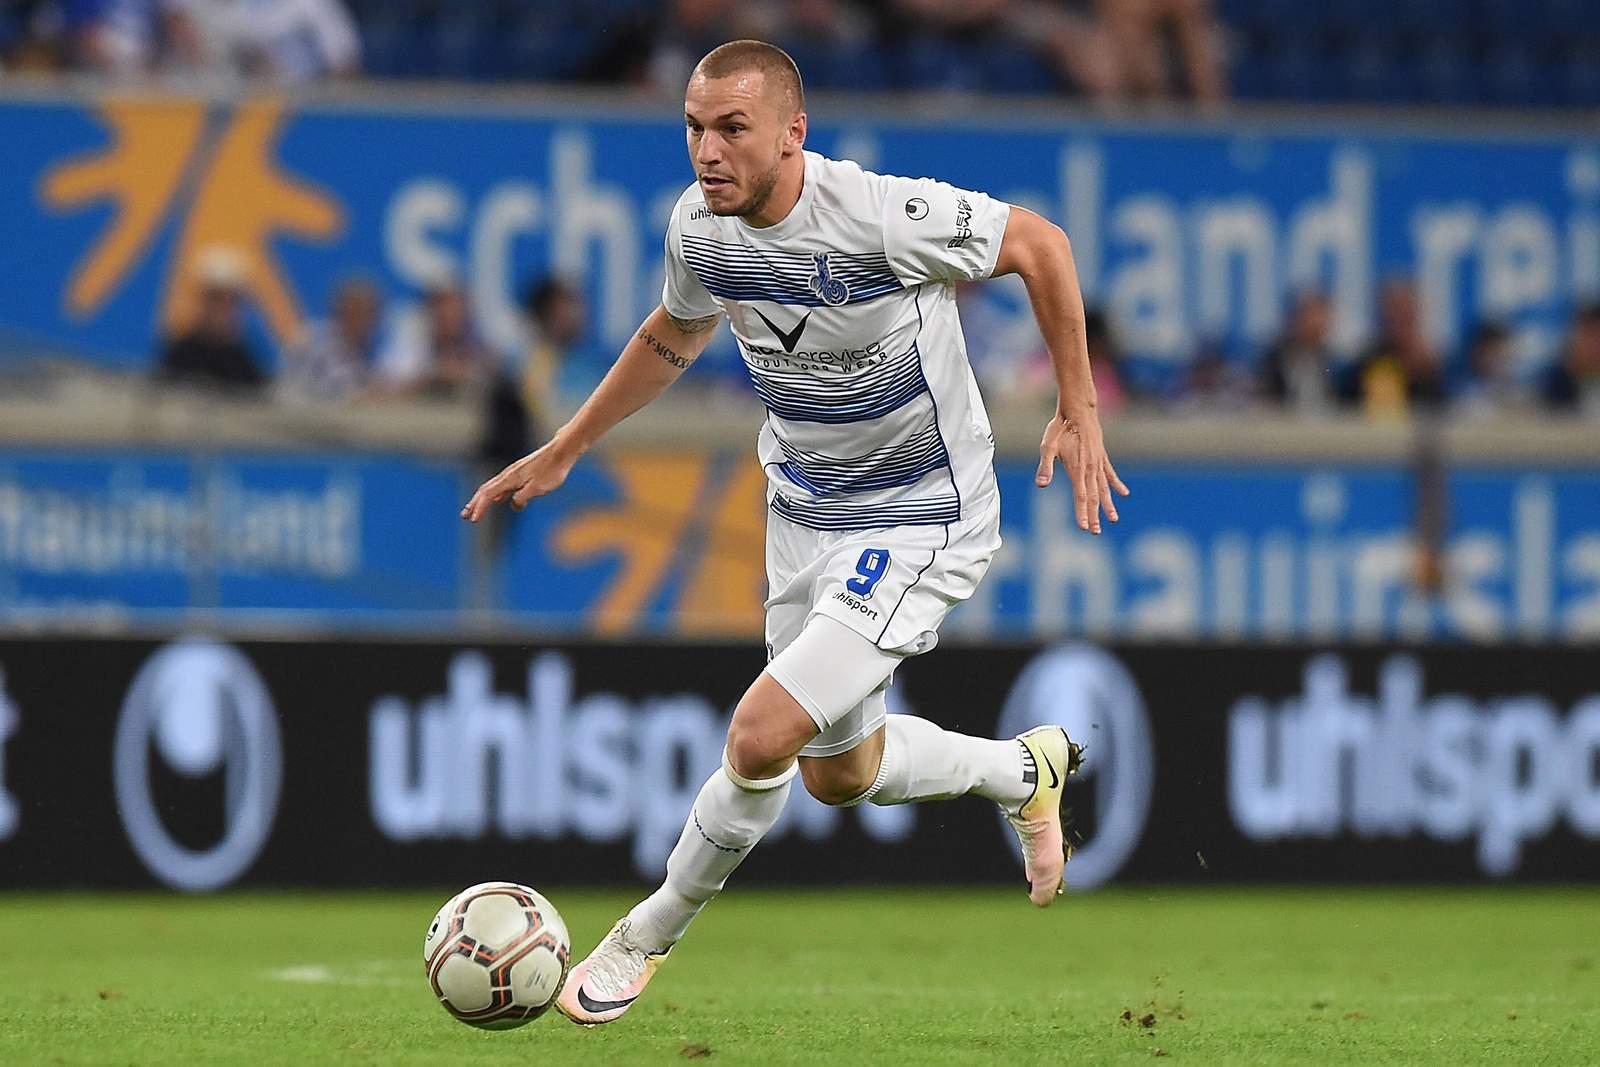 Simon Brandstetter am Ball. Jetzt auf Zwickau gegen Duisburg wetten?